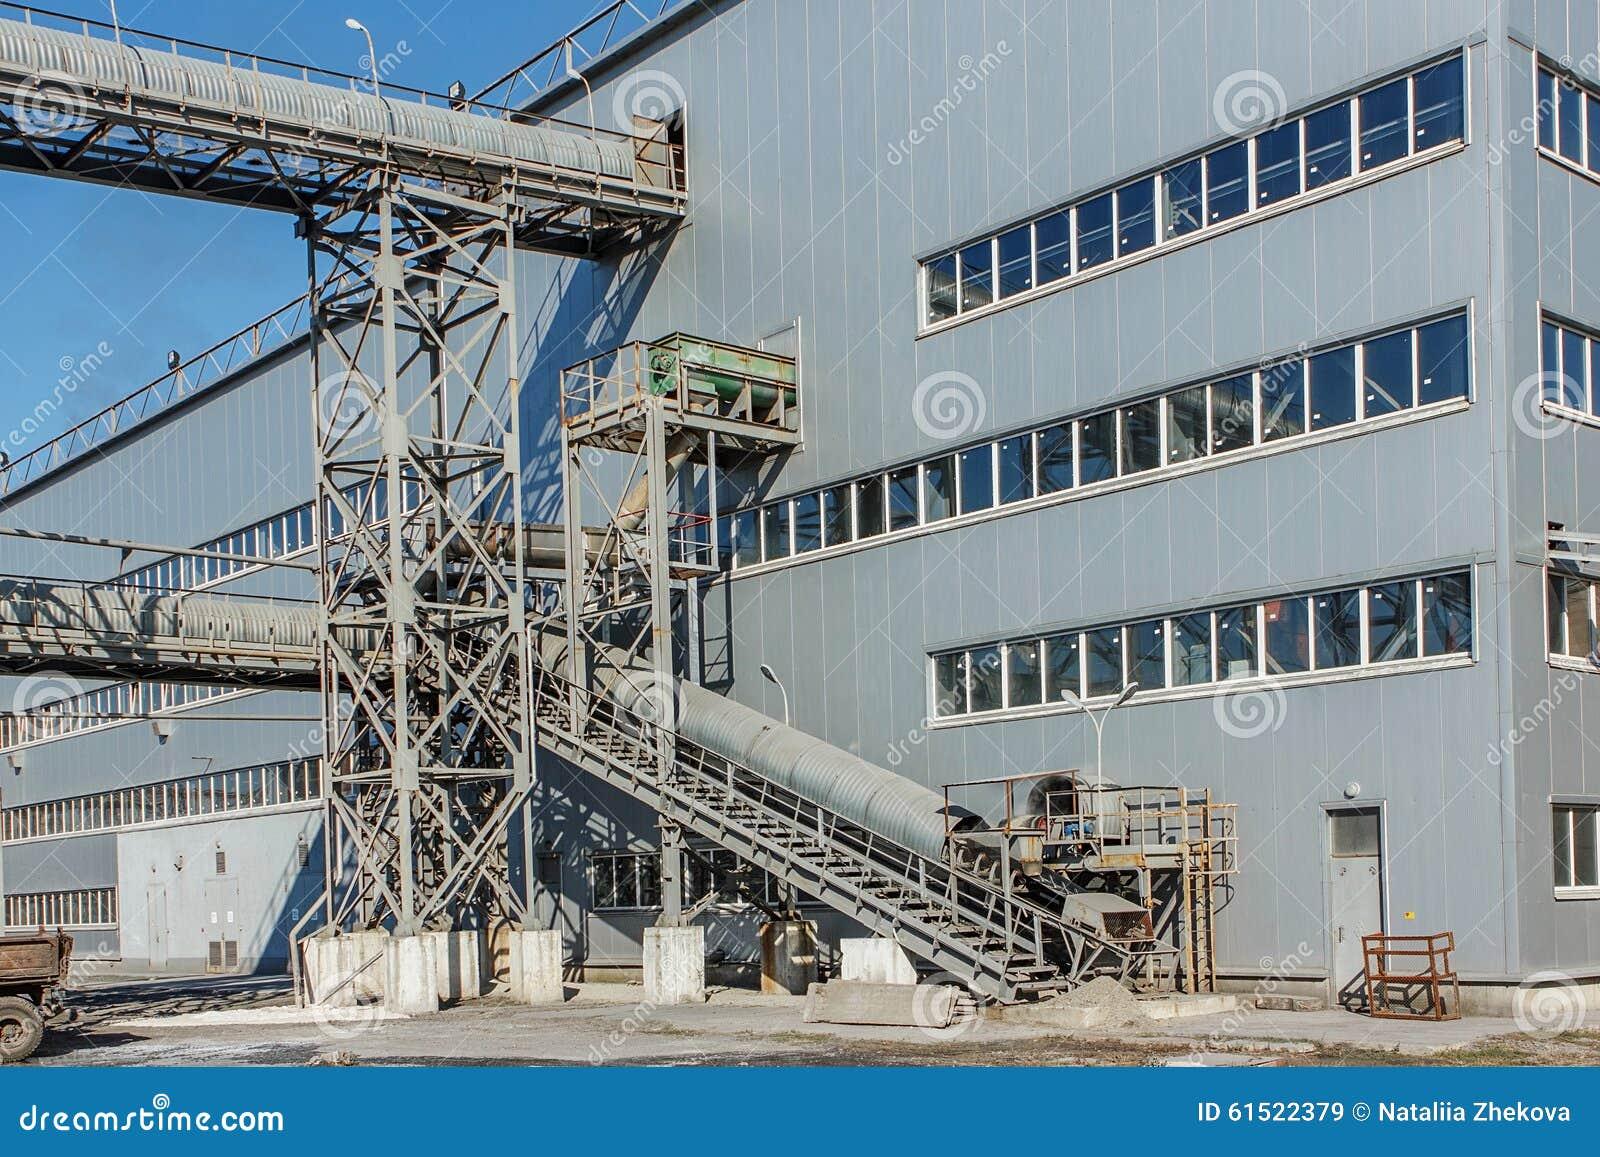 Sugar Beet Factory Industrial Building Stock Photo